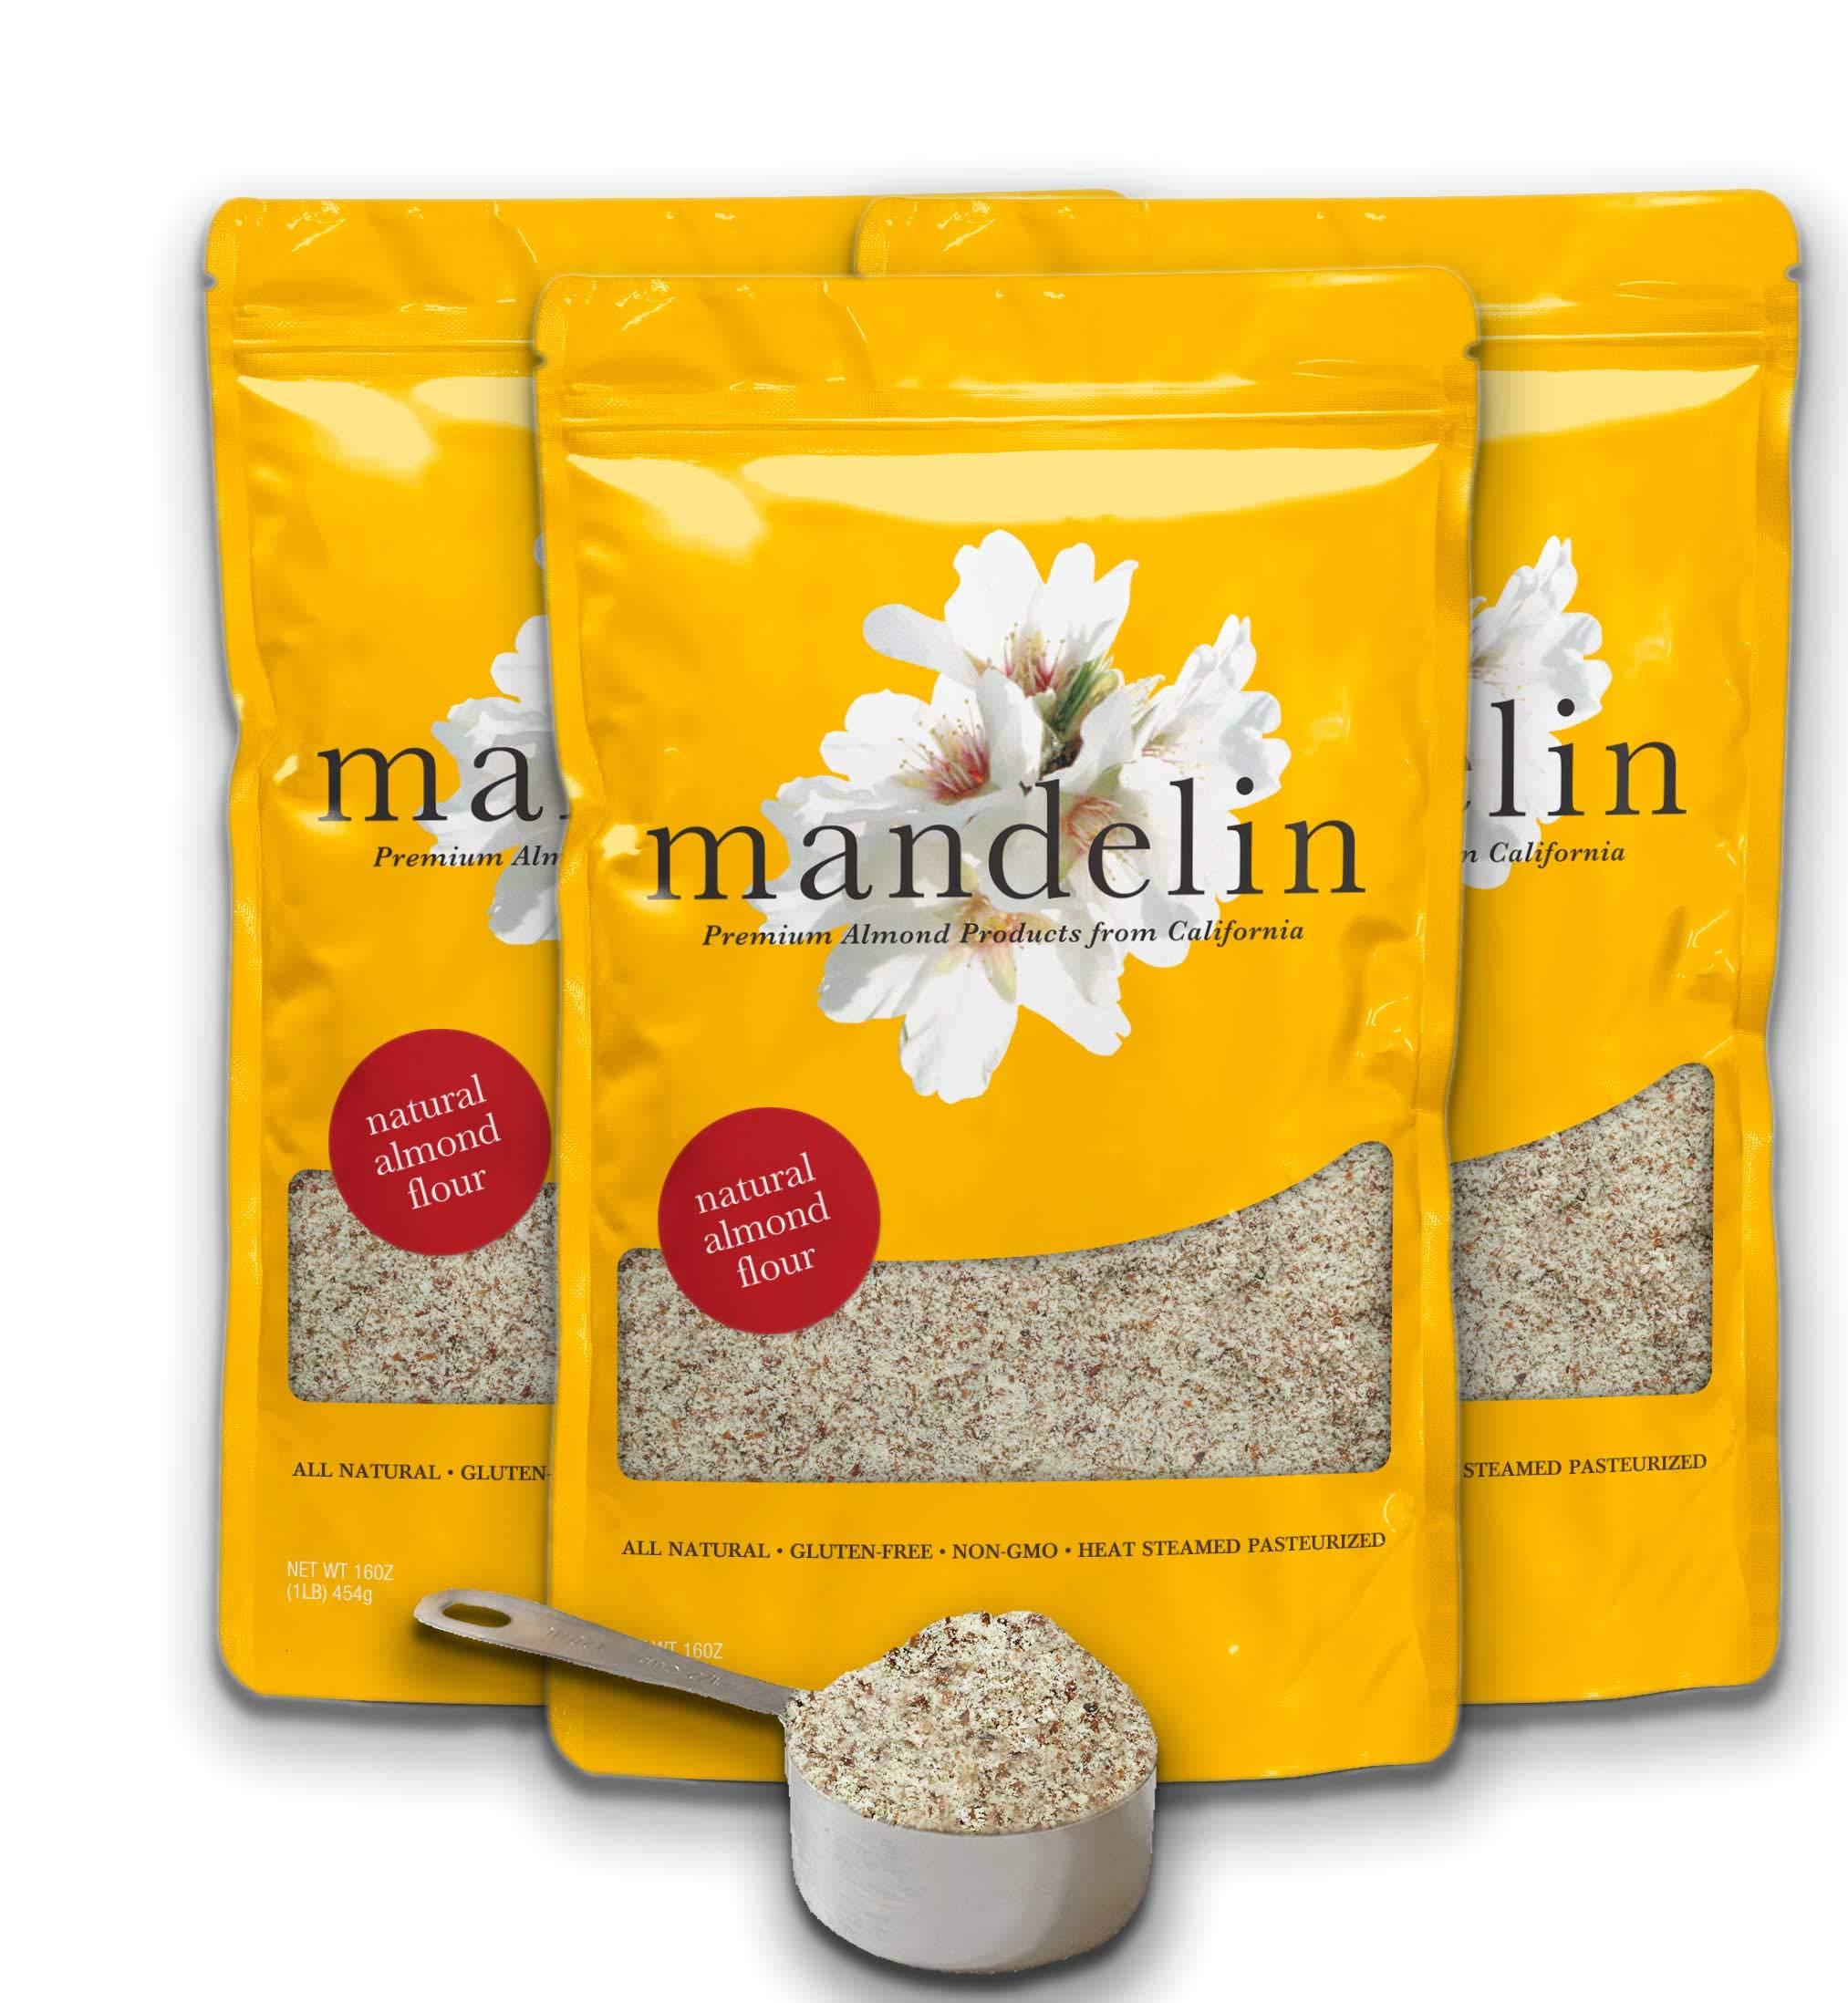 Mandelin Fresh Natural Almond Flour - 100% Almond Flour / Meal, With Skin, Super Fine Mill, Non-GMO, Gluten Free, Vegan, Keto, Plant Based Diet Friendly (3 lb)